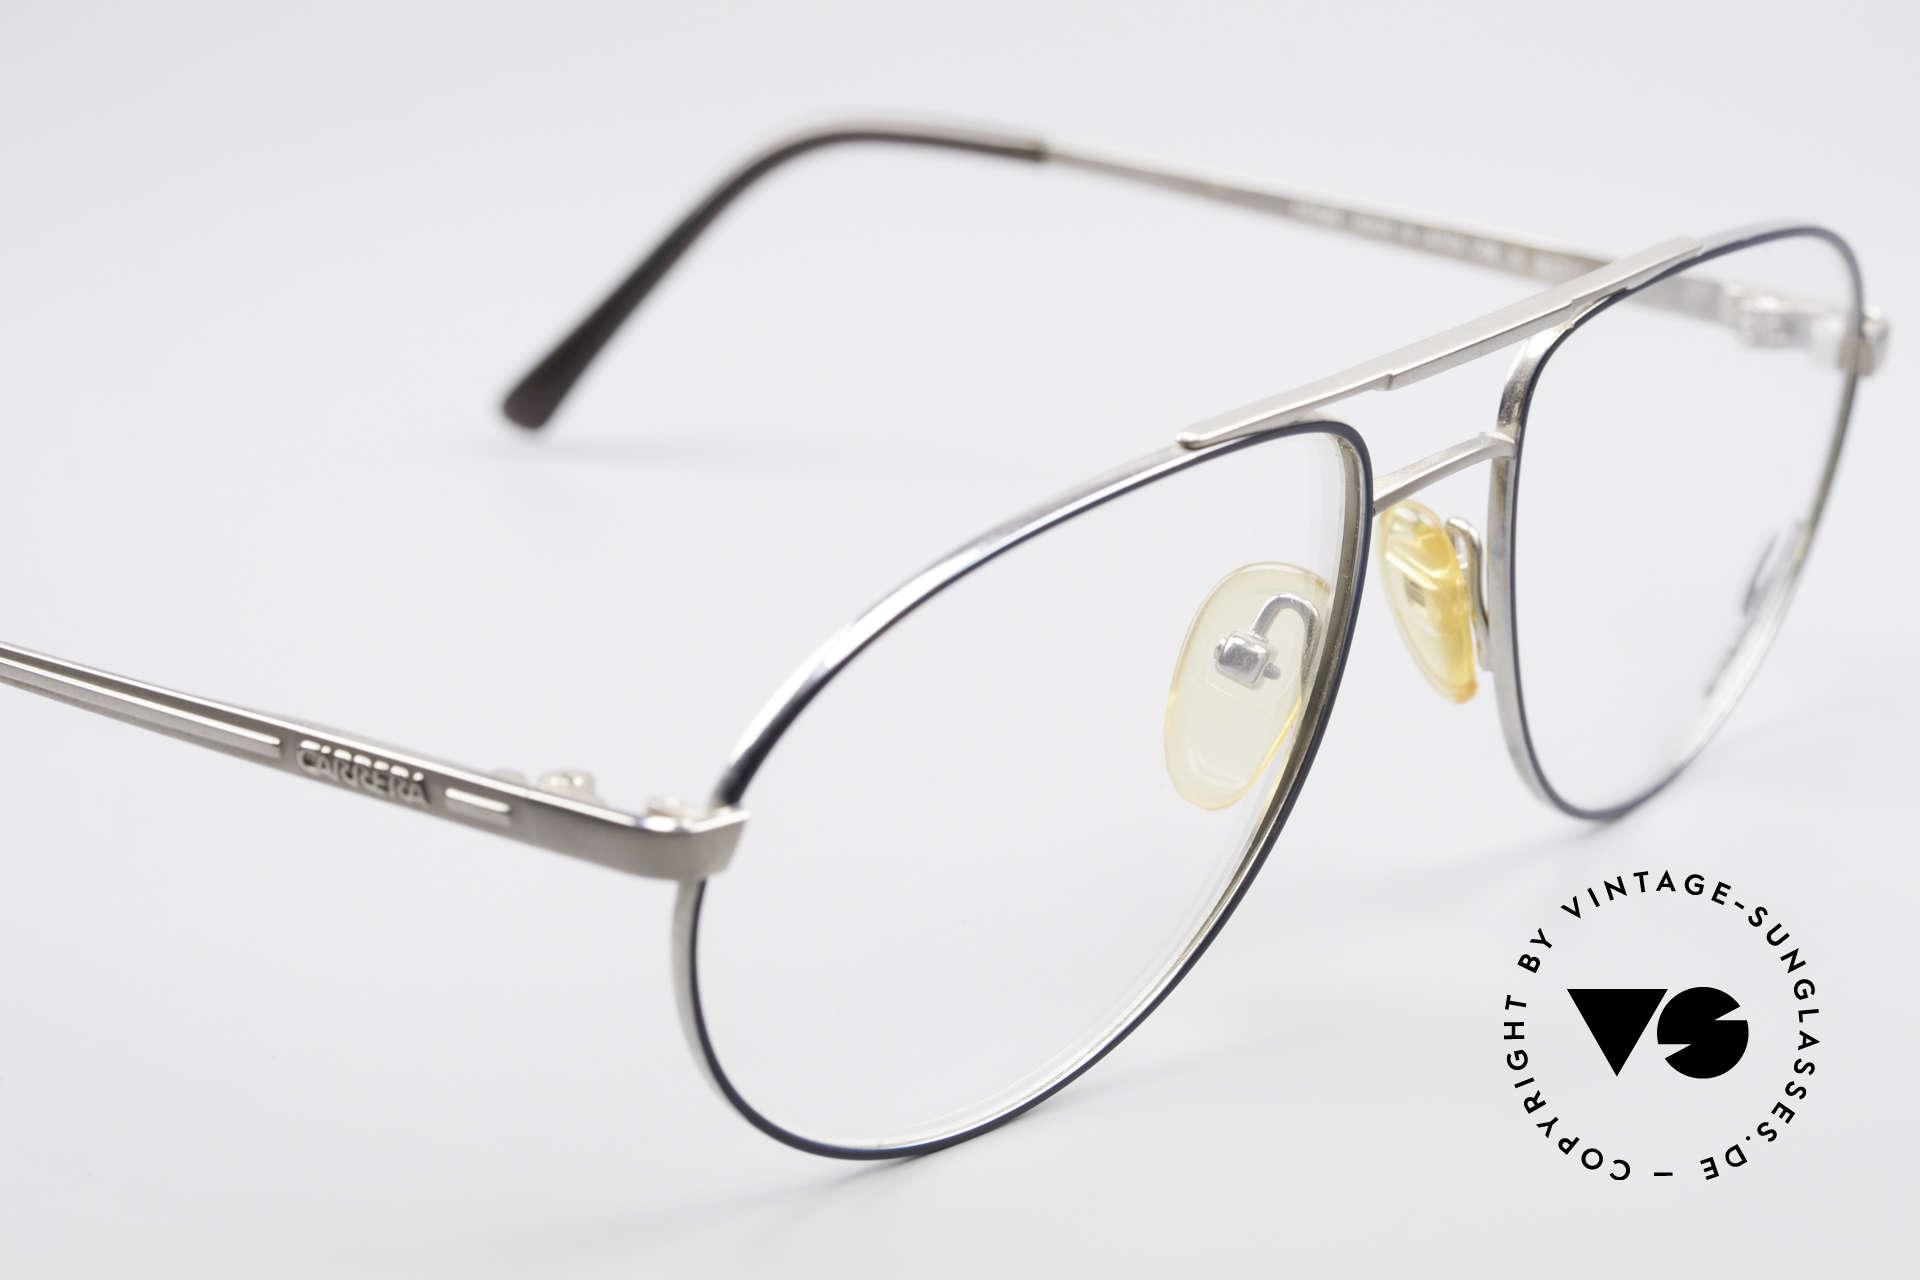 Carrera 5798 Titanium Vintage Eyeglasses, never worn (like all our rare vintage Carrera frames), Made for Men